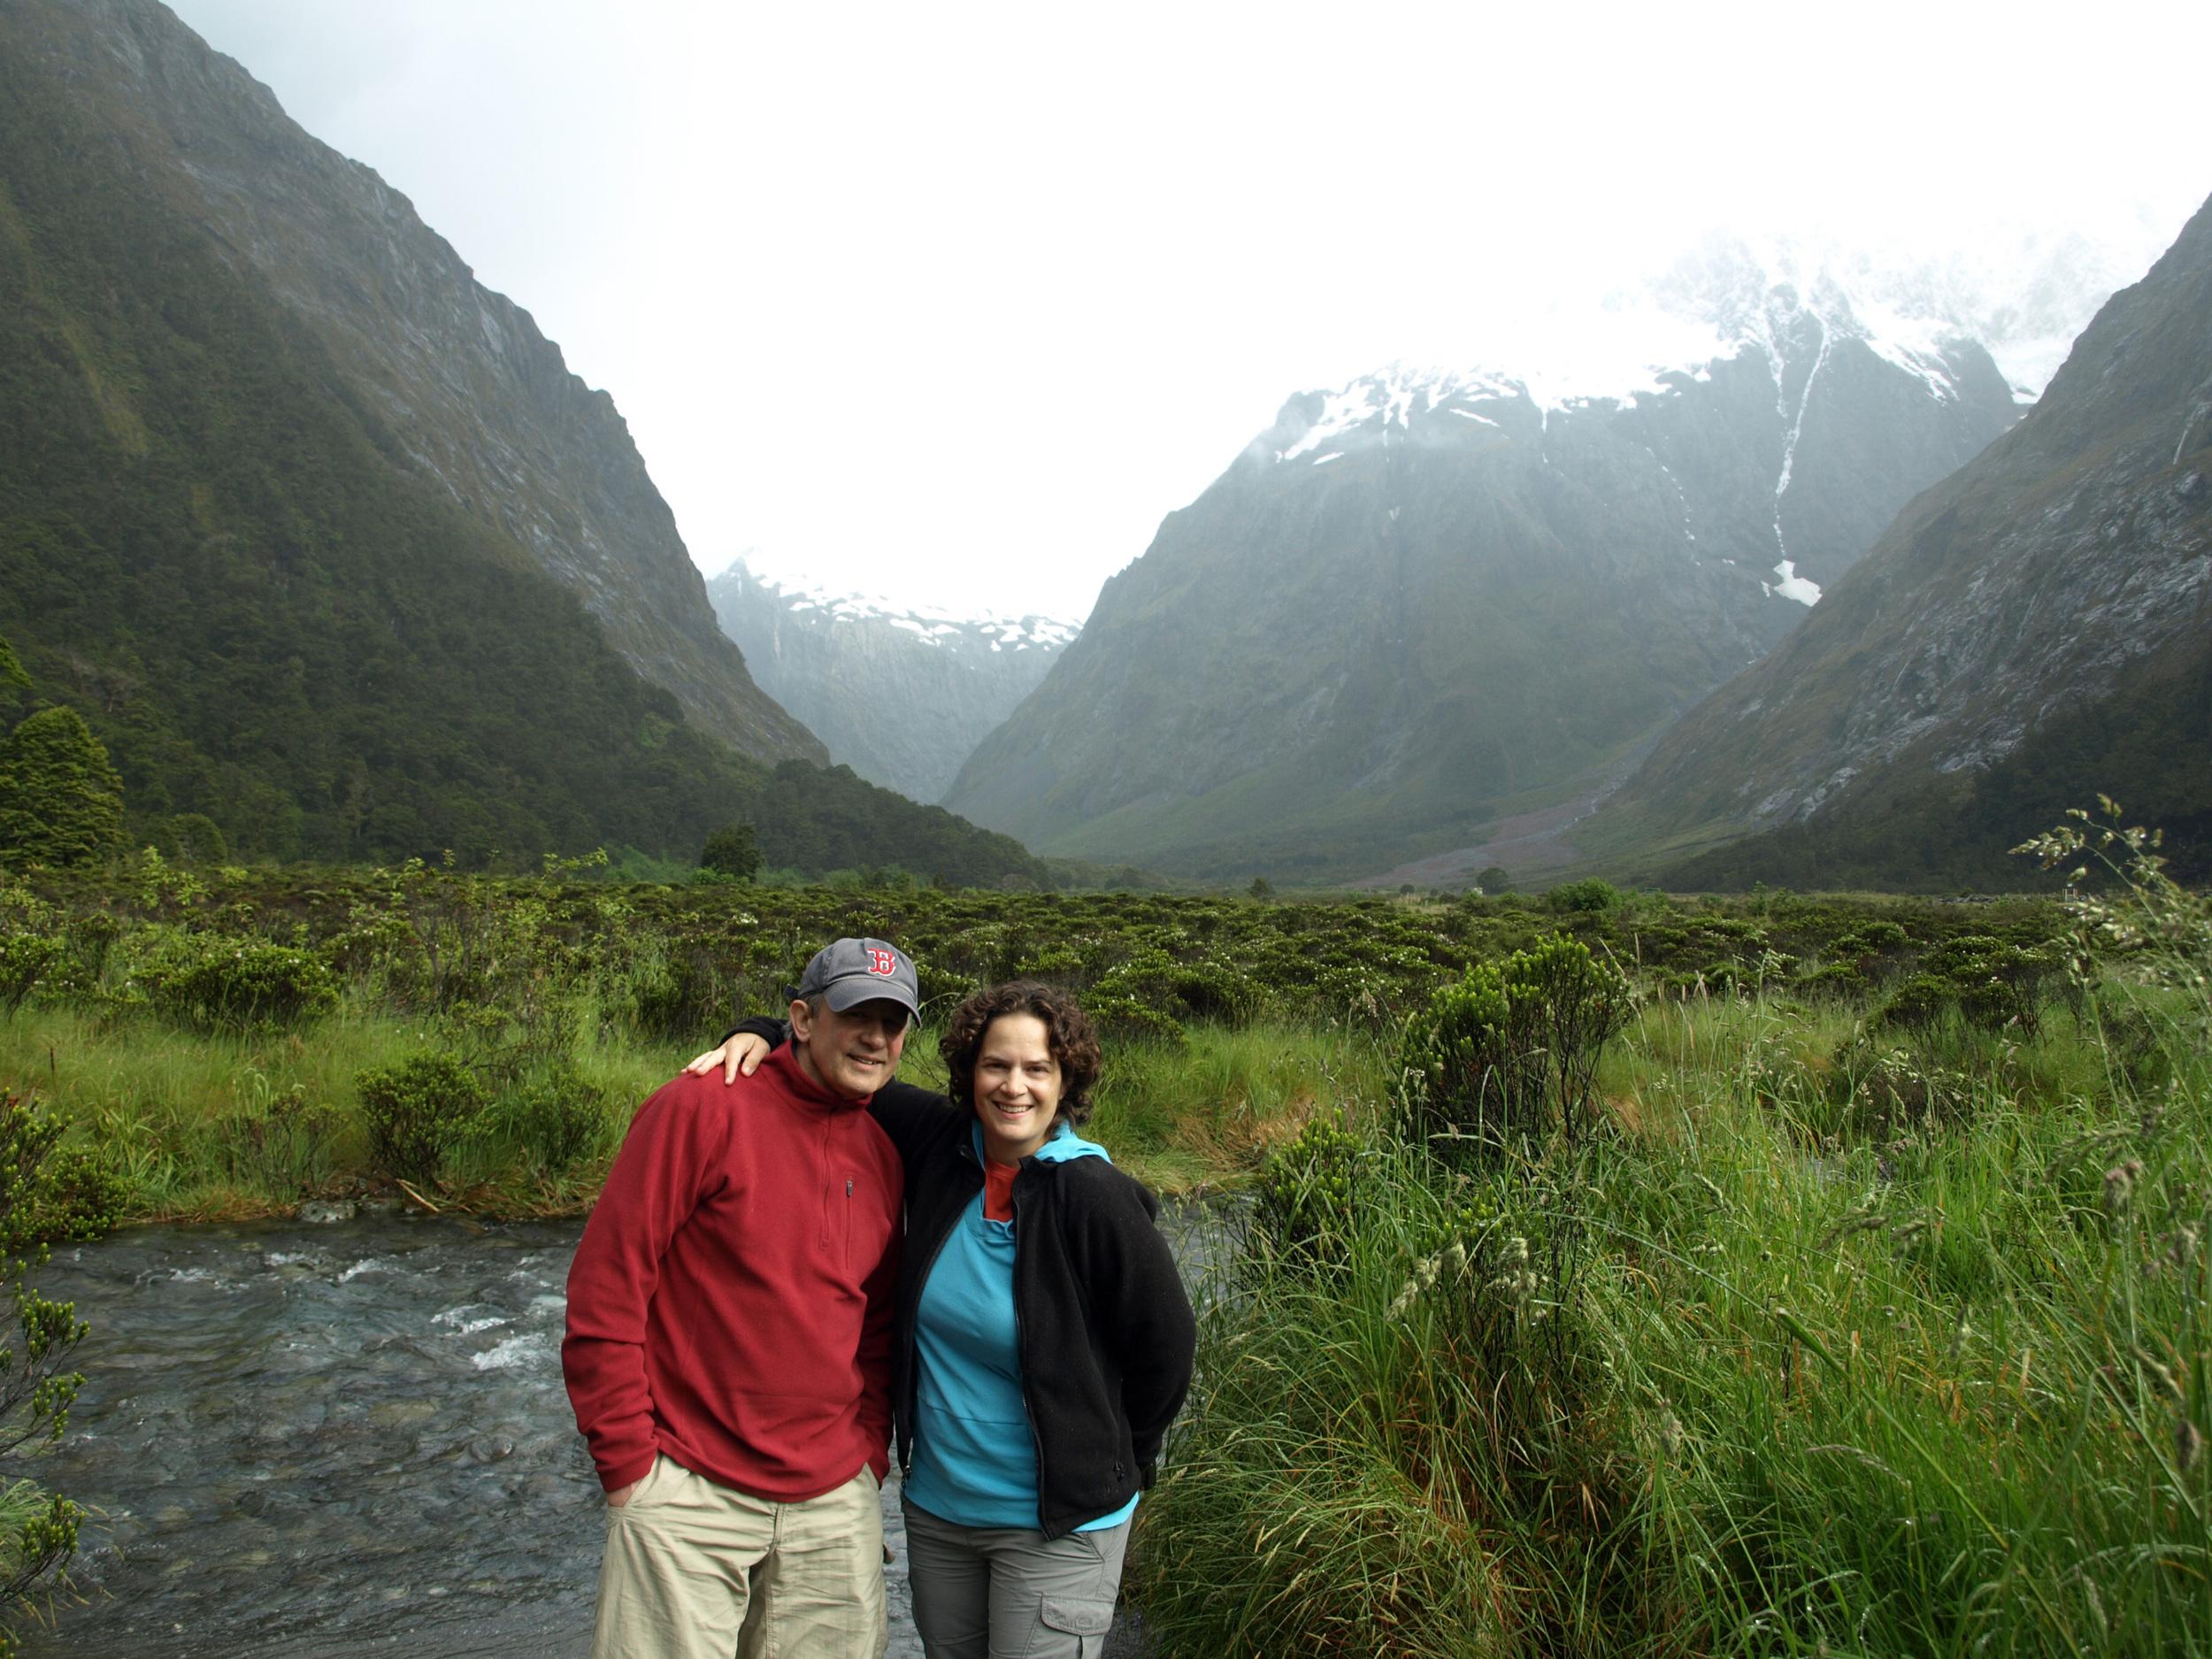 Entering The Fiordland